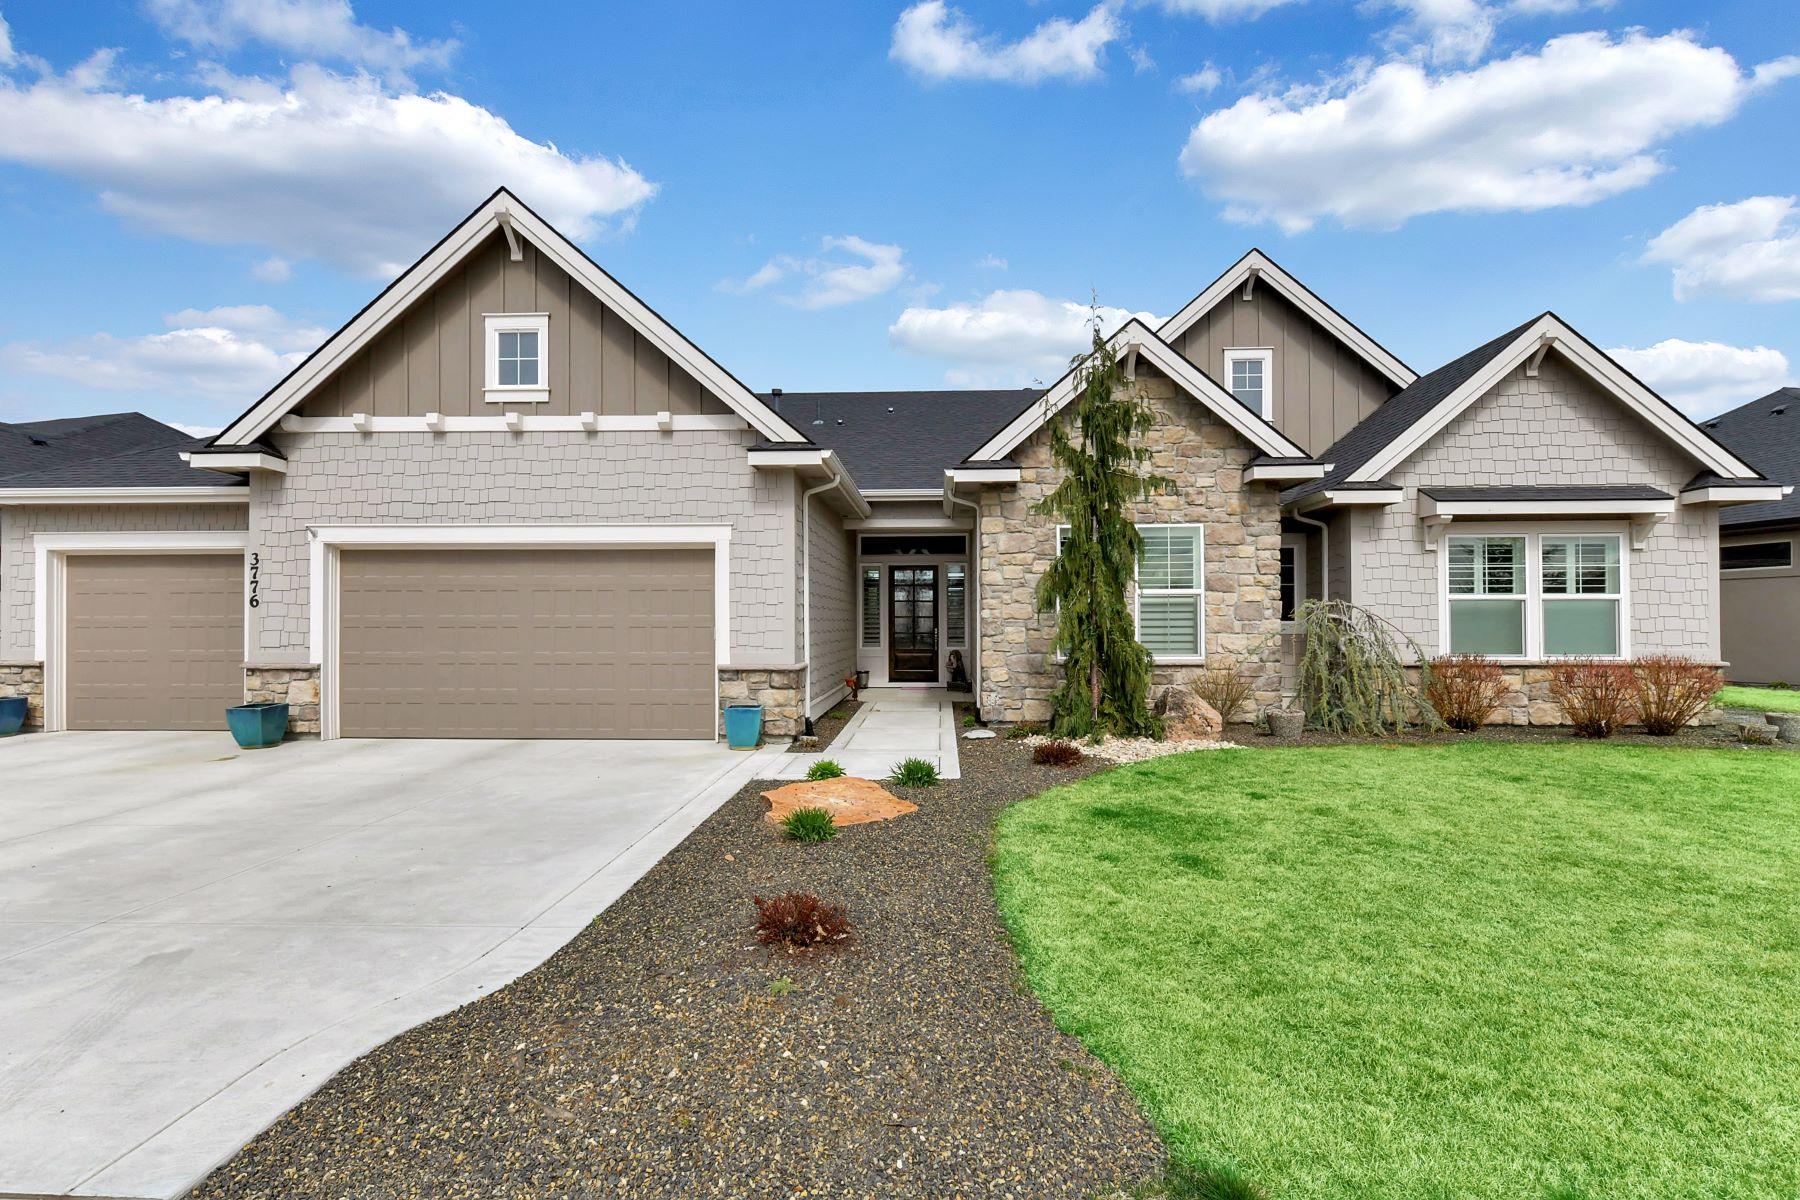 Single Family Home for Active at 3776 Temple, Eagle 3776 W Temple Eagle, Idaho 83616 United States